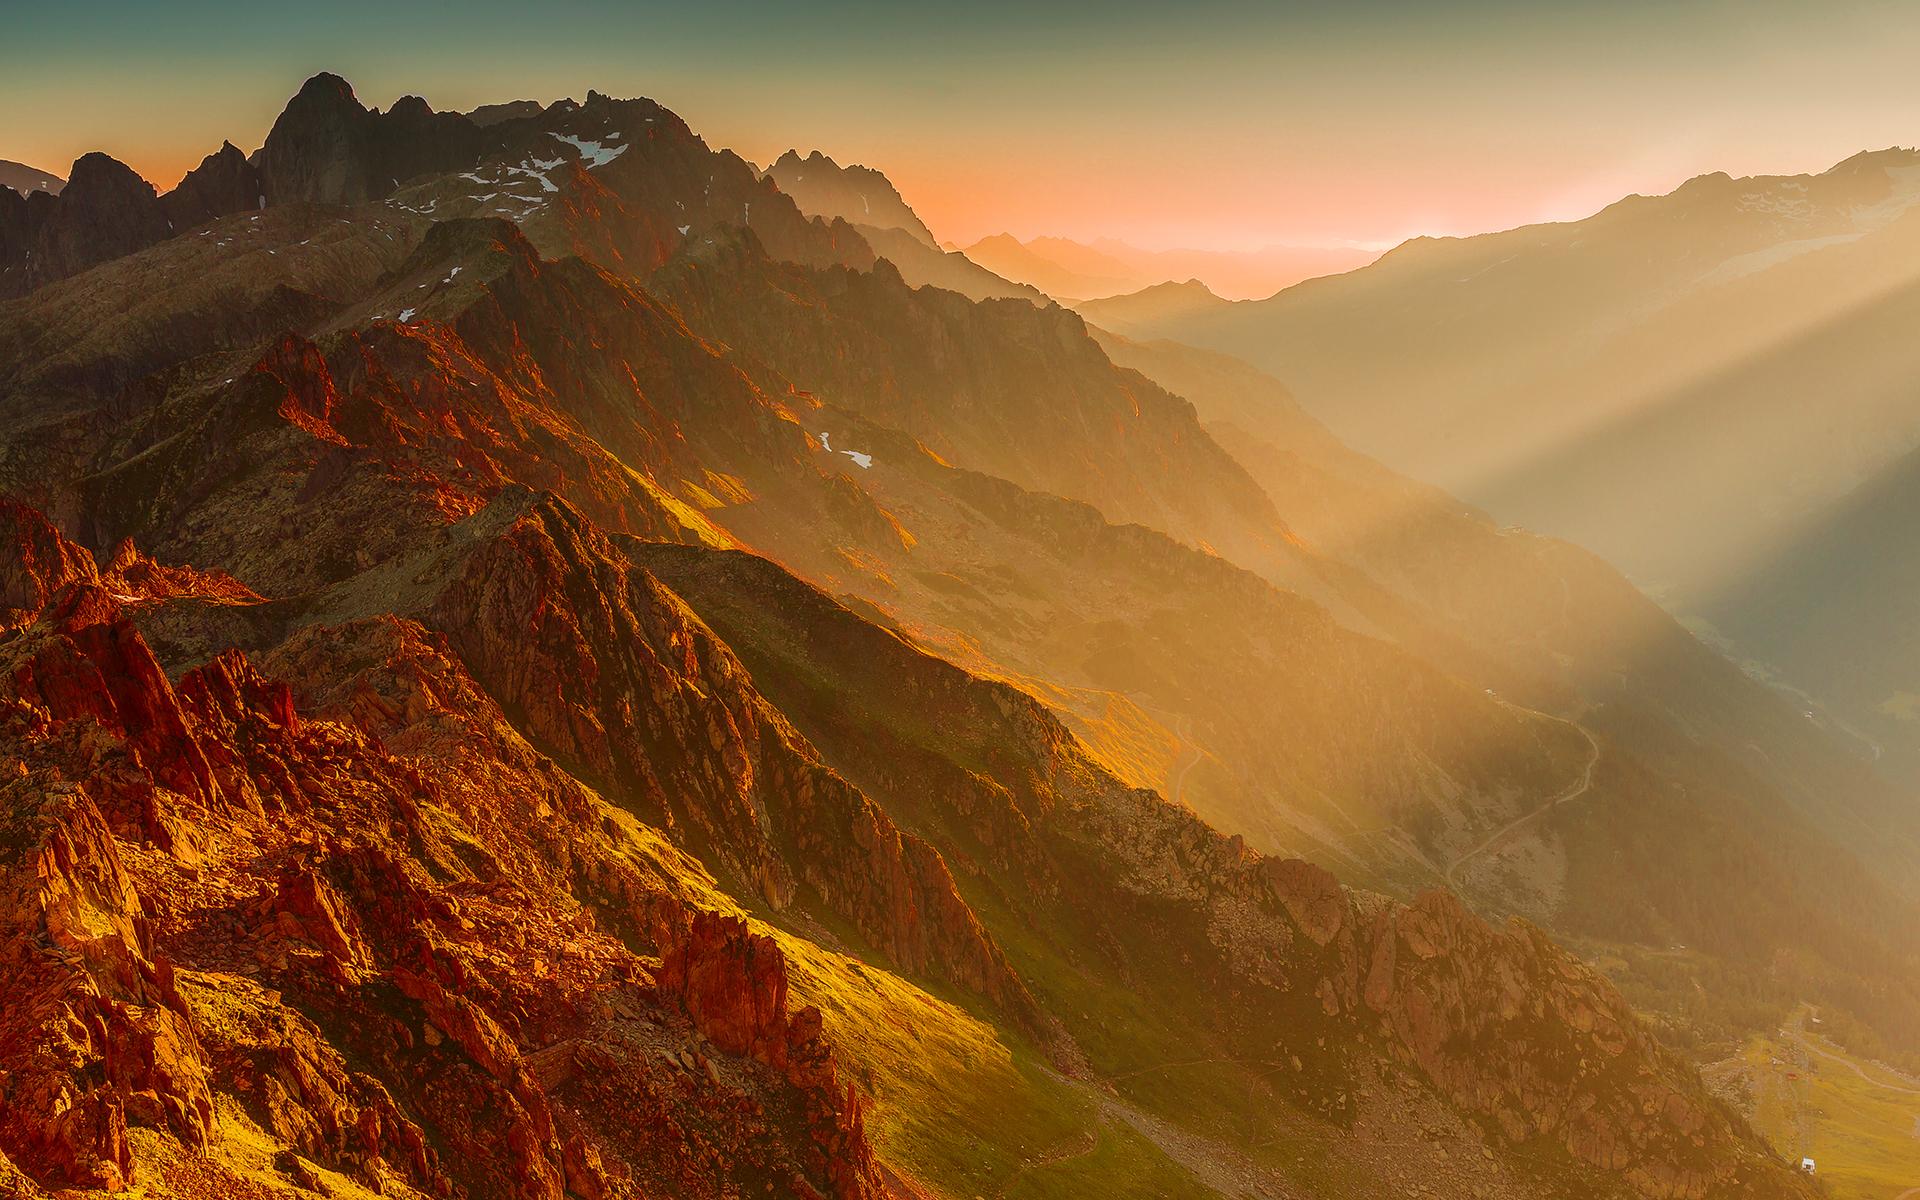 Car And Bikes Wallpapers Free Download Mountains Sunset Wallpaper Hd Hd Desktop Wallpapers 4k Hd